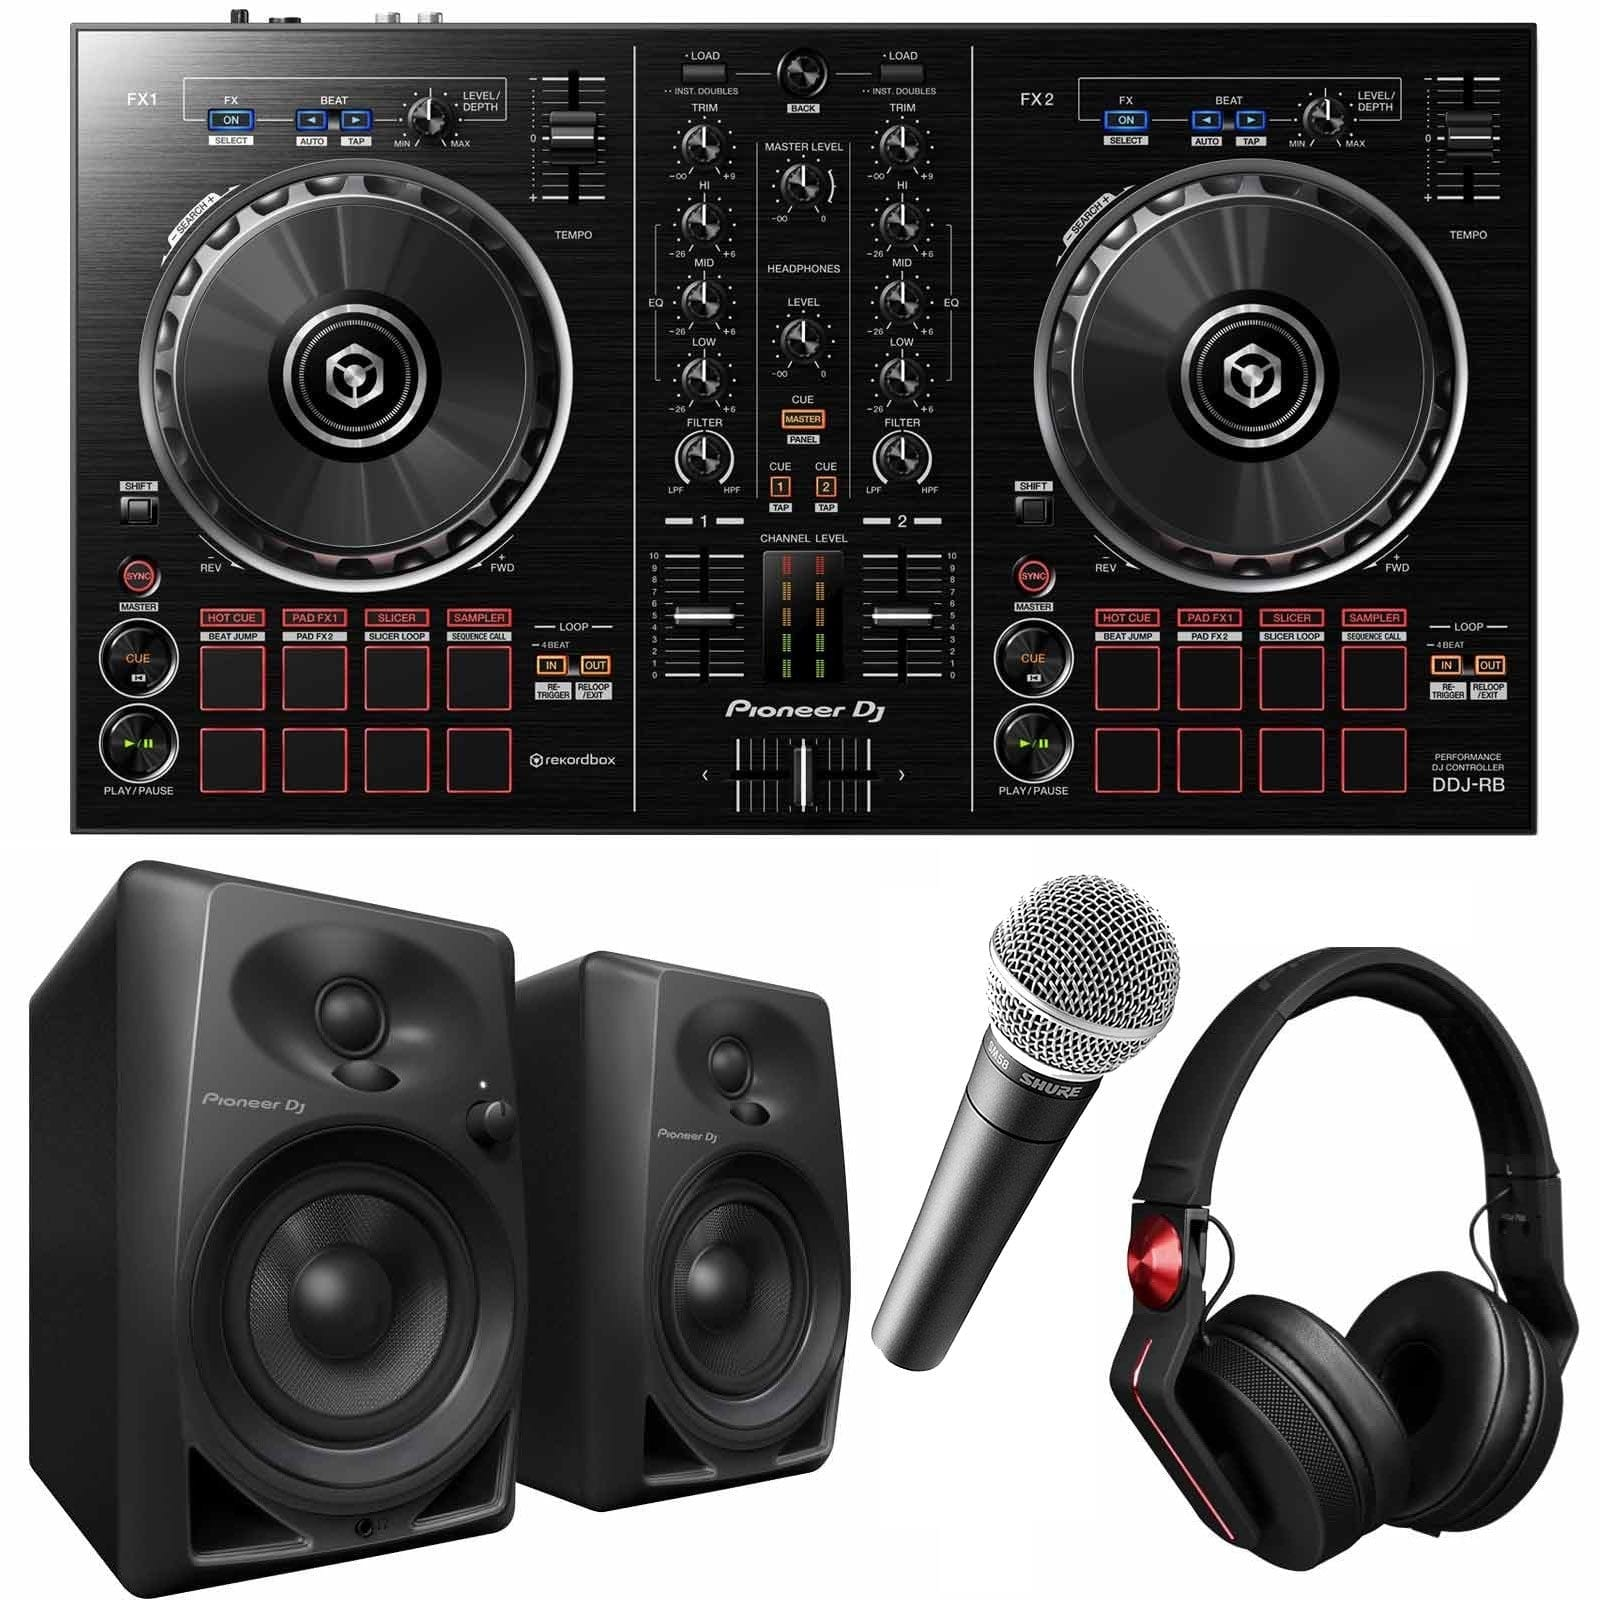 pioneer-pk-stp02-ddj-rb-dj-controller-starter-kit-with-dm-40-active-monitor-speakers-hdj-700-dj-headphones-928